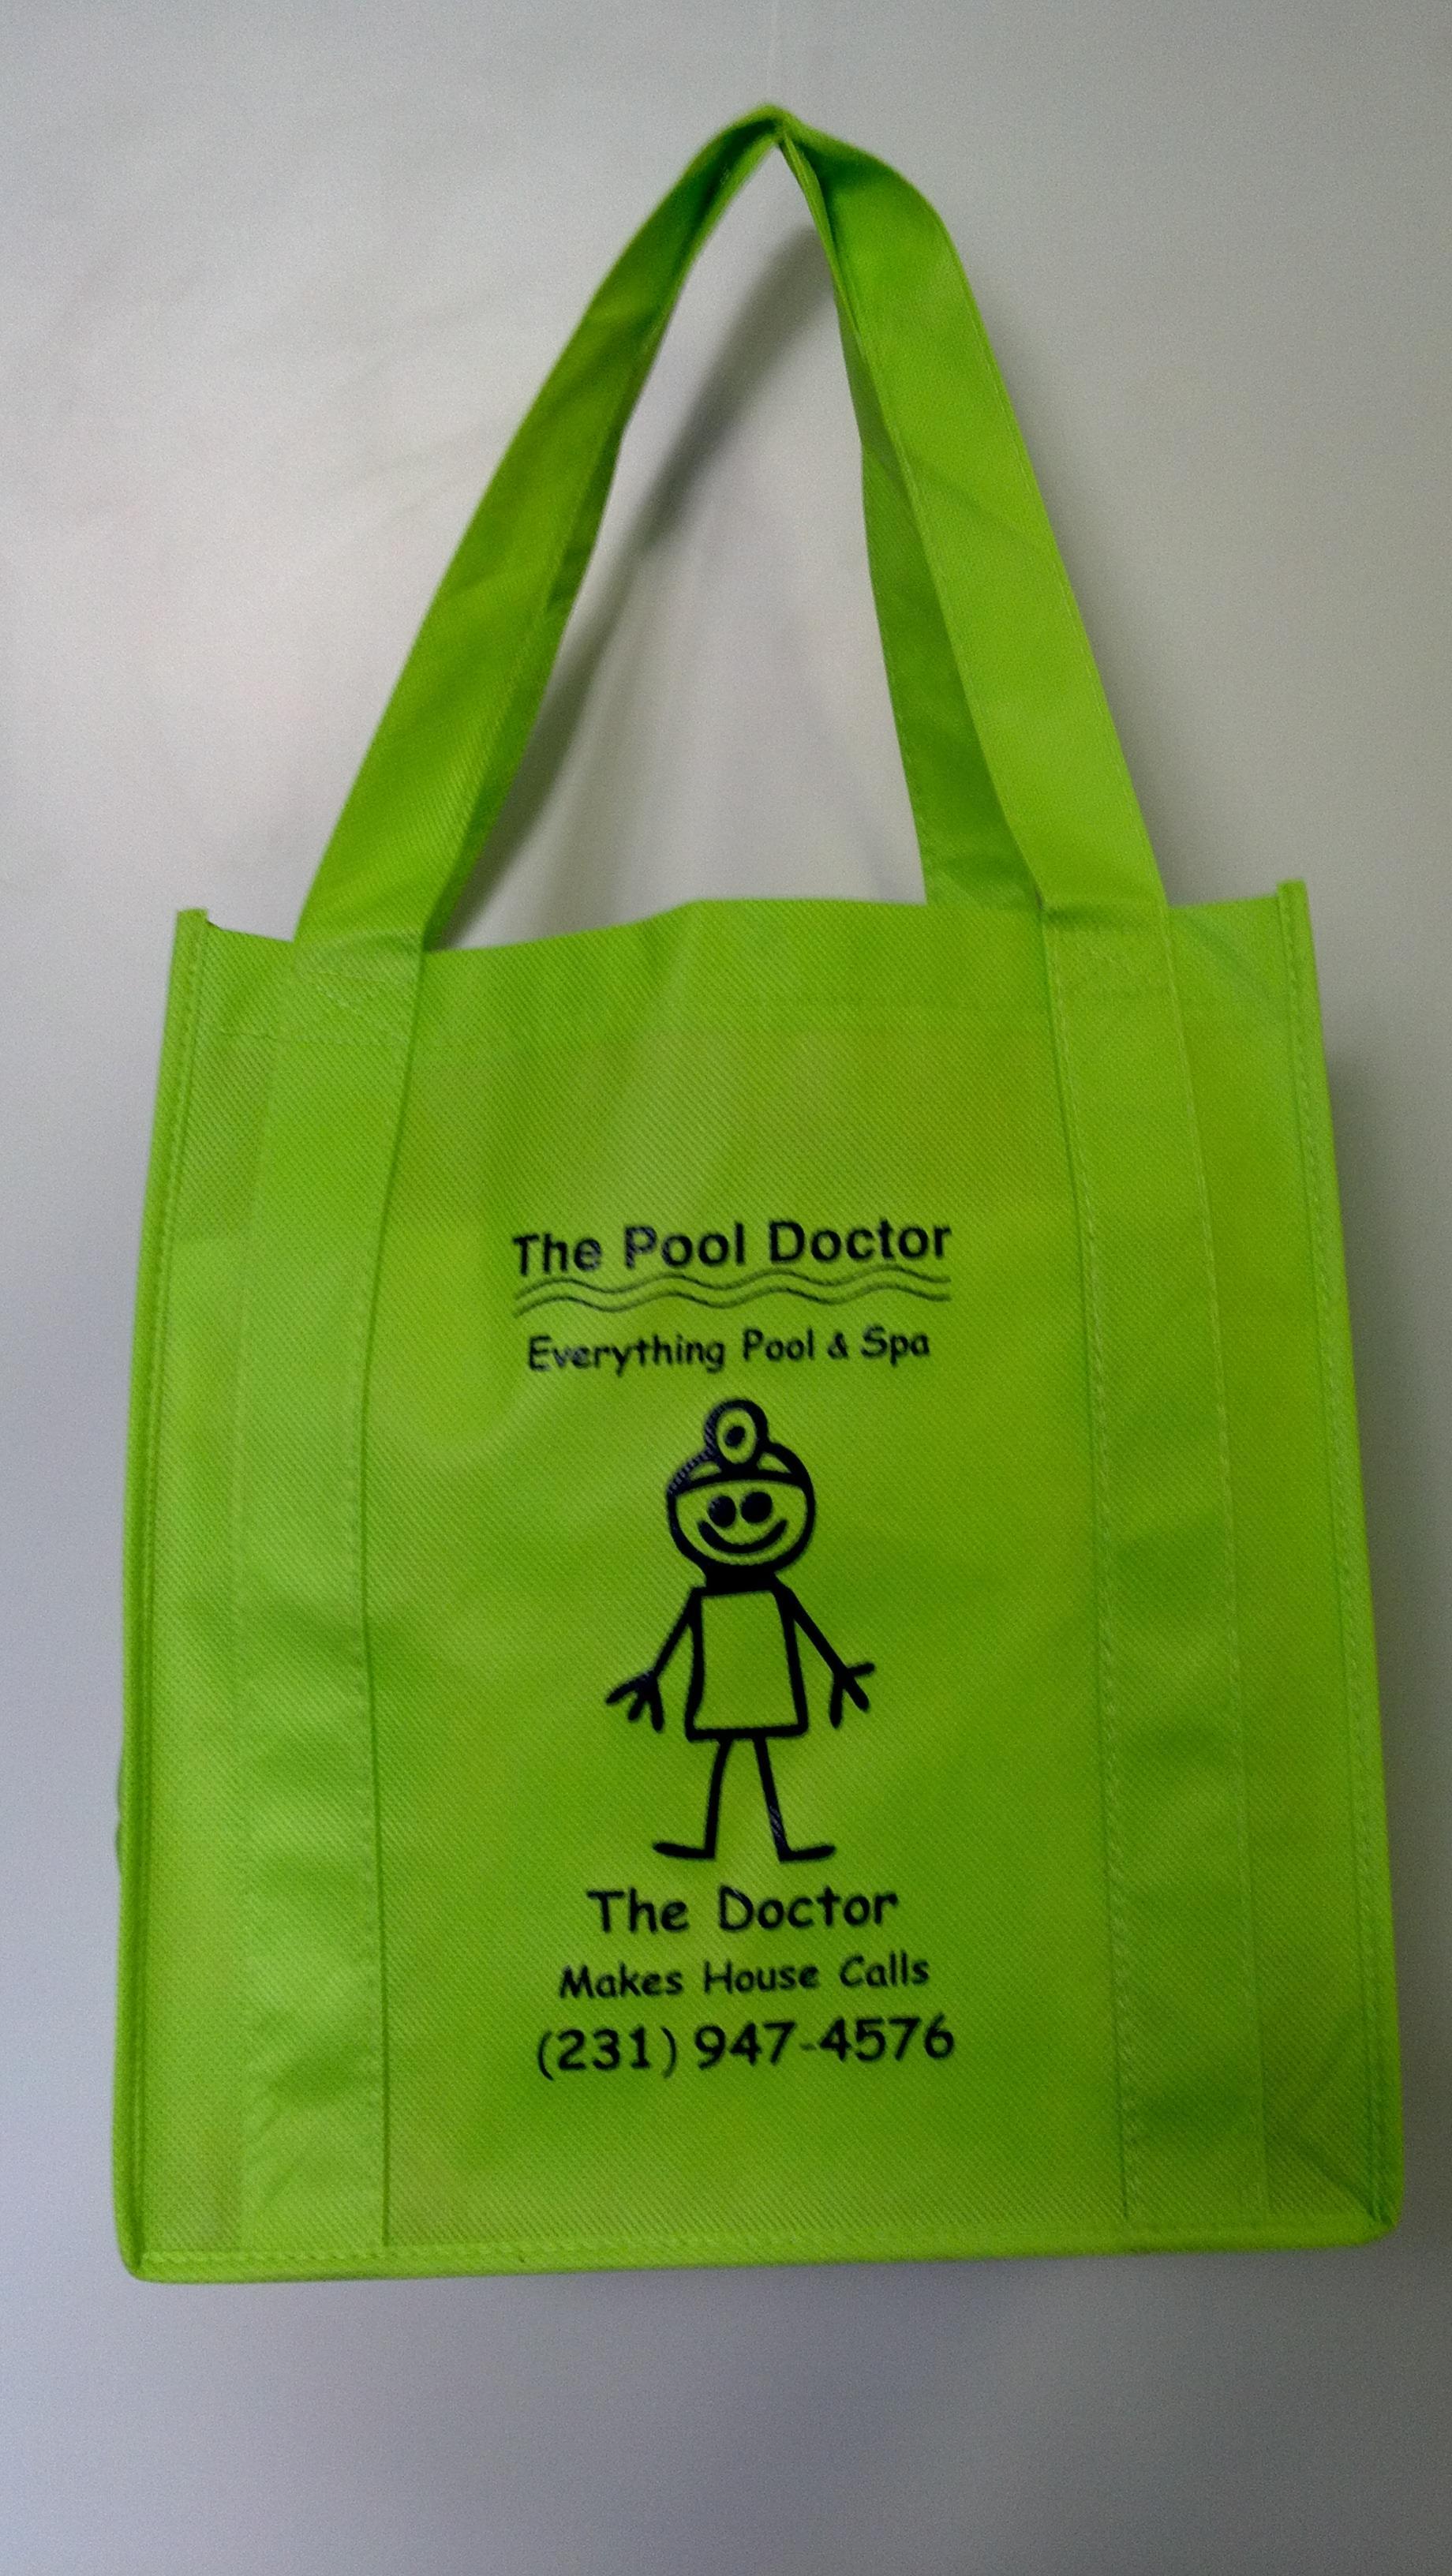 The Pool Doctor, LLC image 7